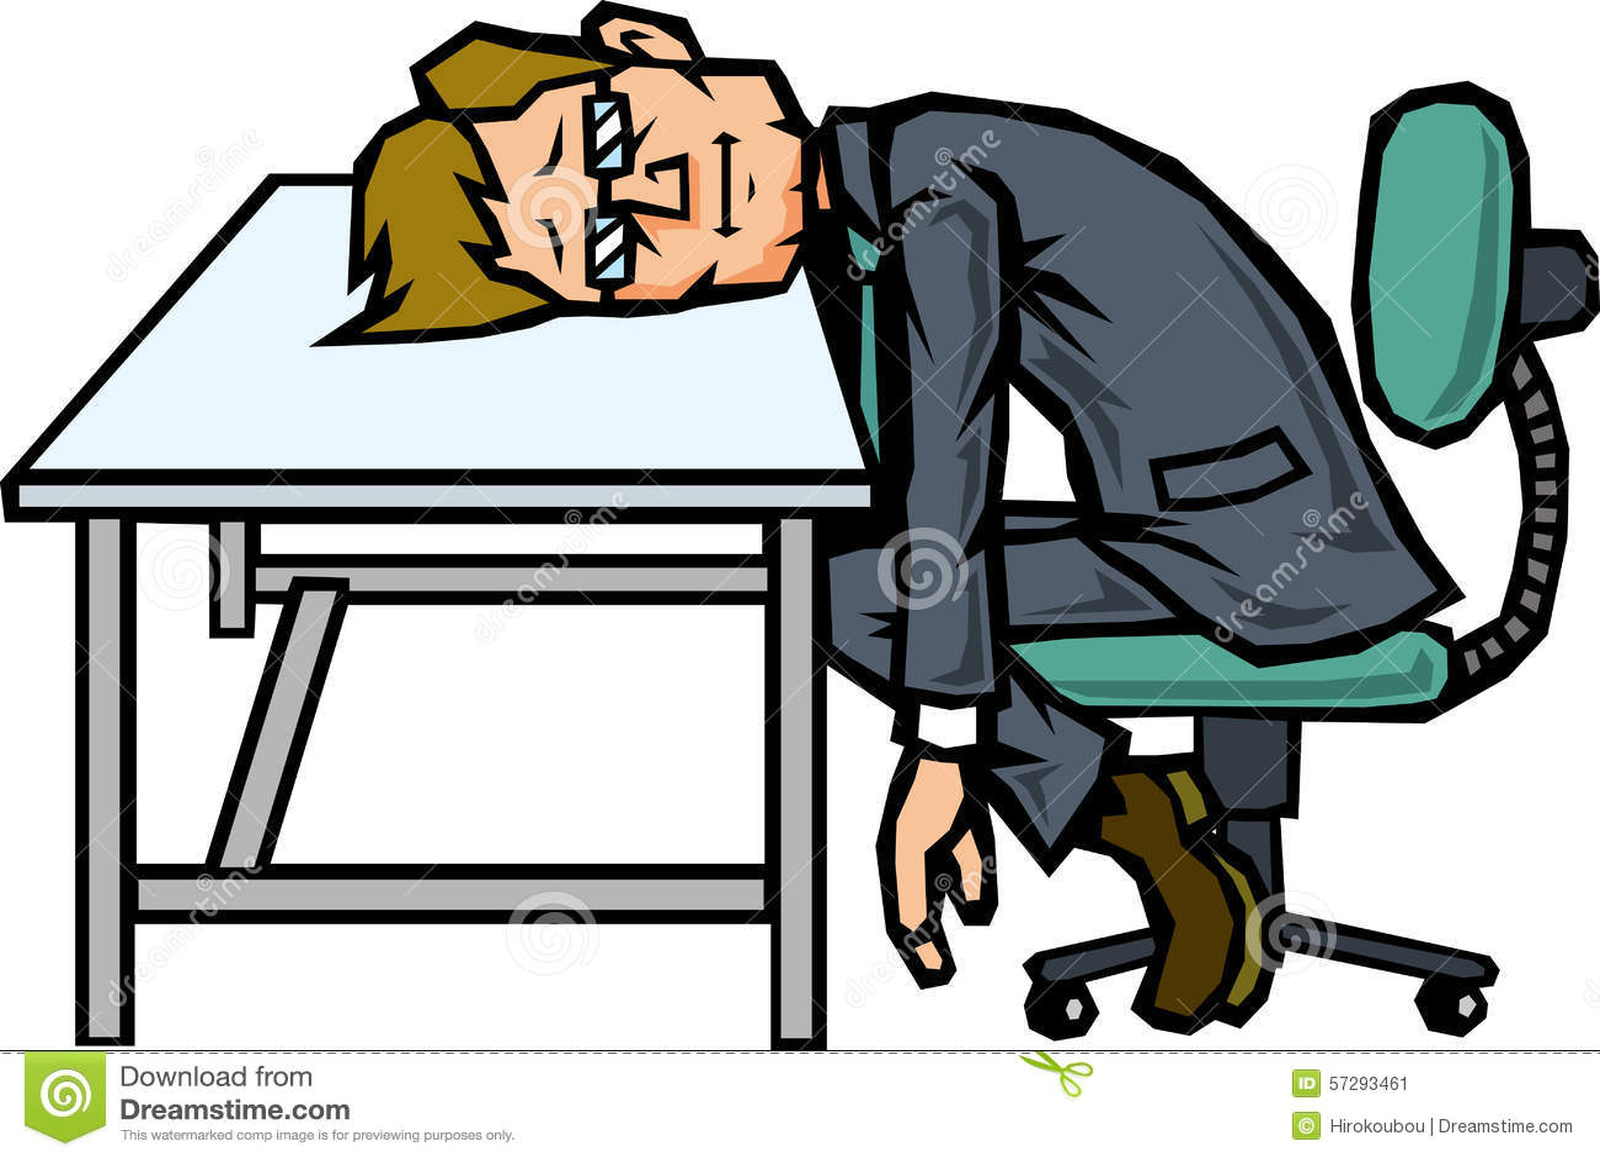 No Motivation Businessman Stock Illustration Image 57293461 : no motivation businessman to leaning desk 57293461  from www.dreamstime.com size 1300 x 958 jpeg 117kB